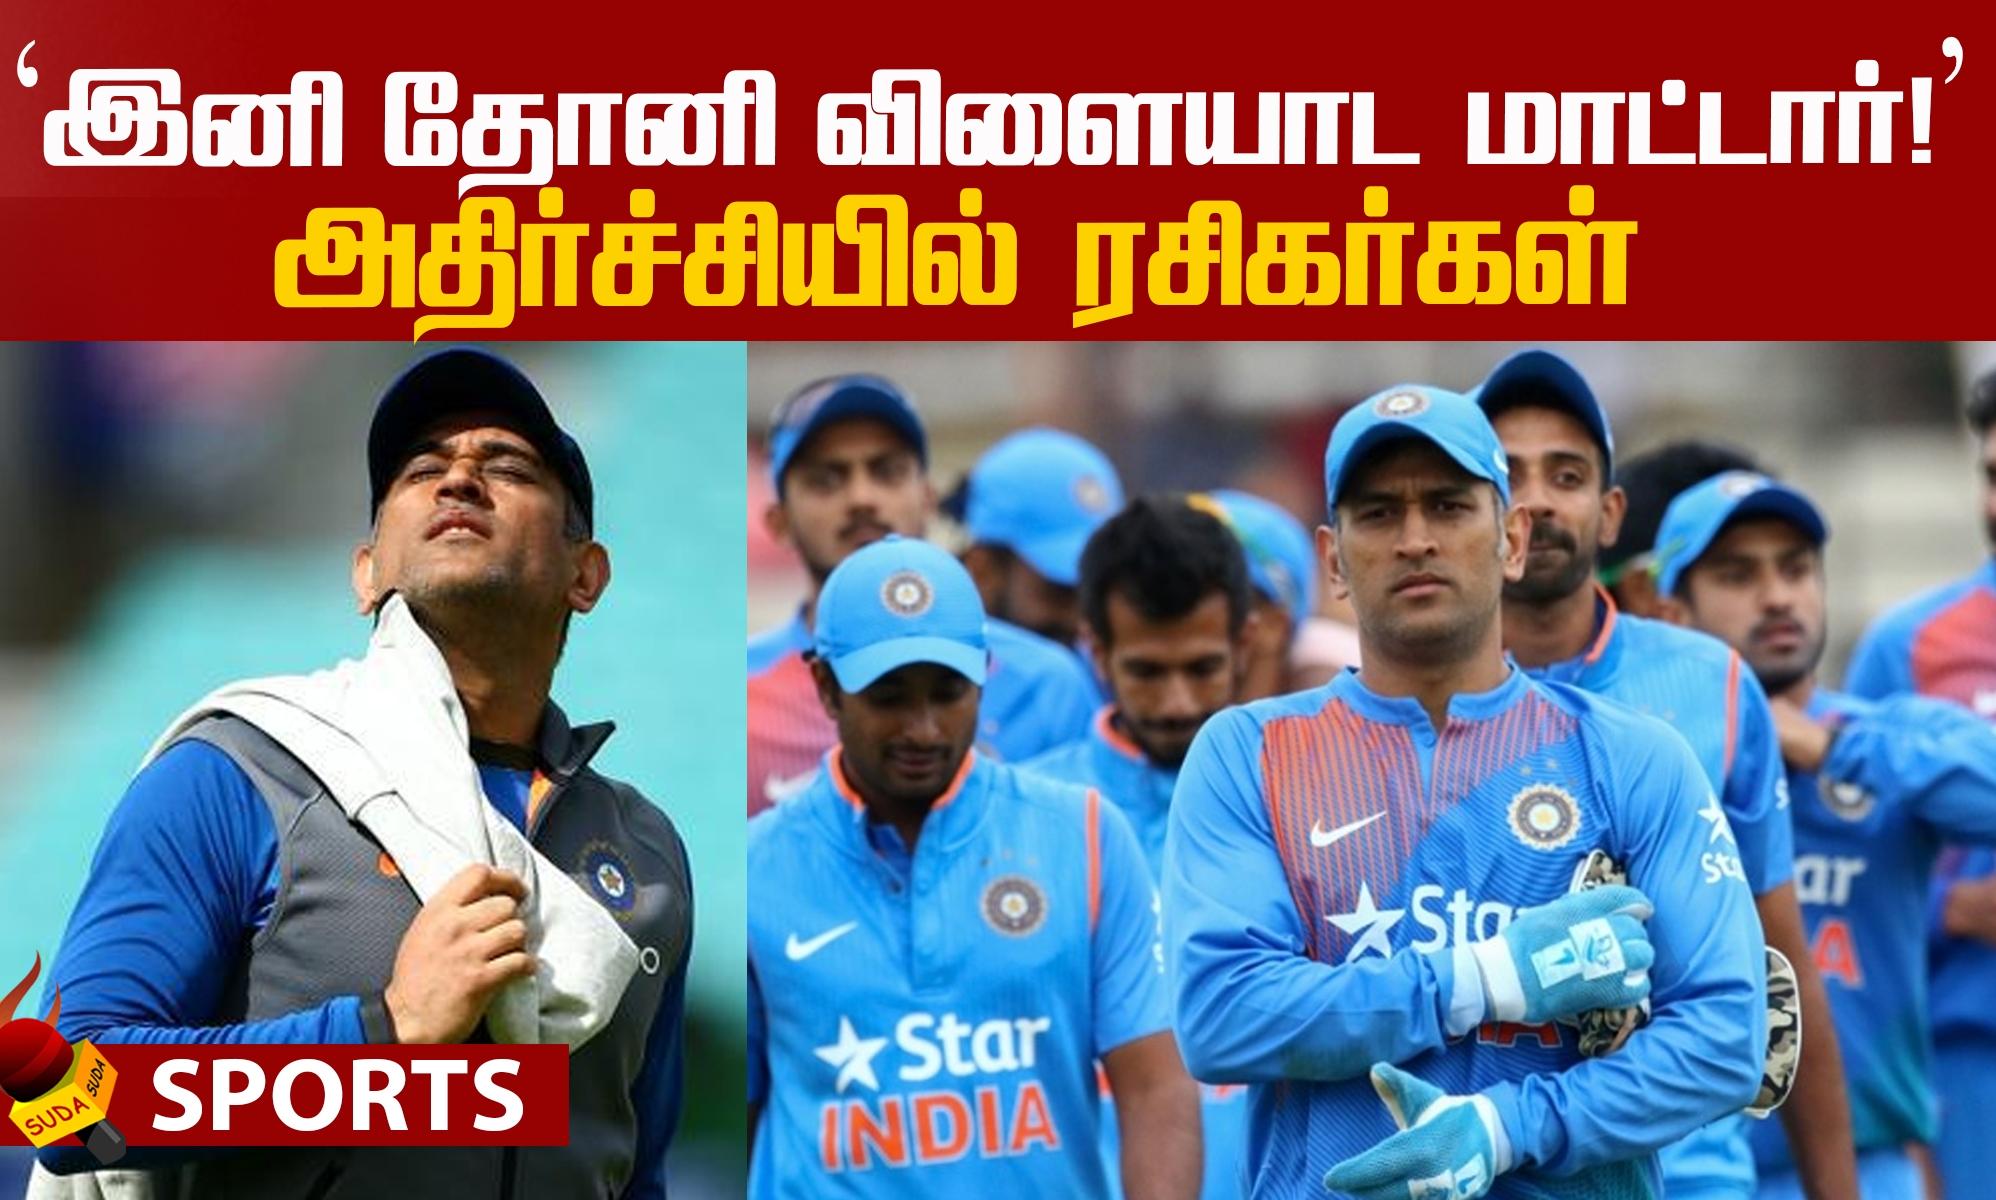 I don't think Dhoni will play for India again: Harbhajan